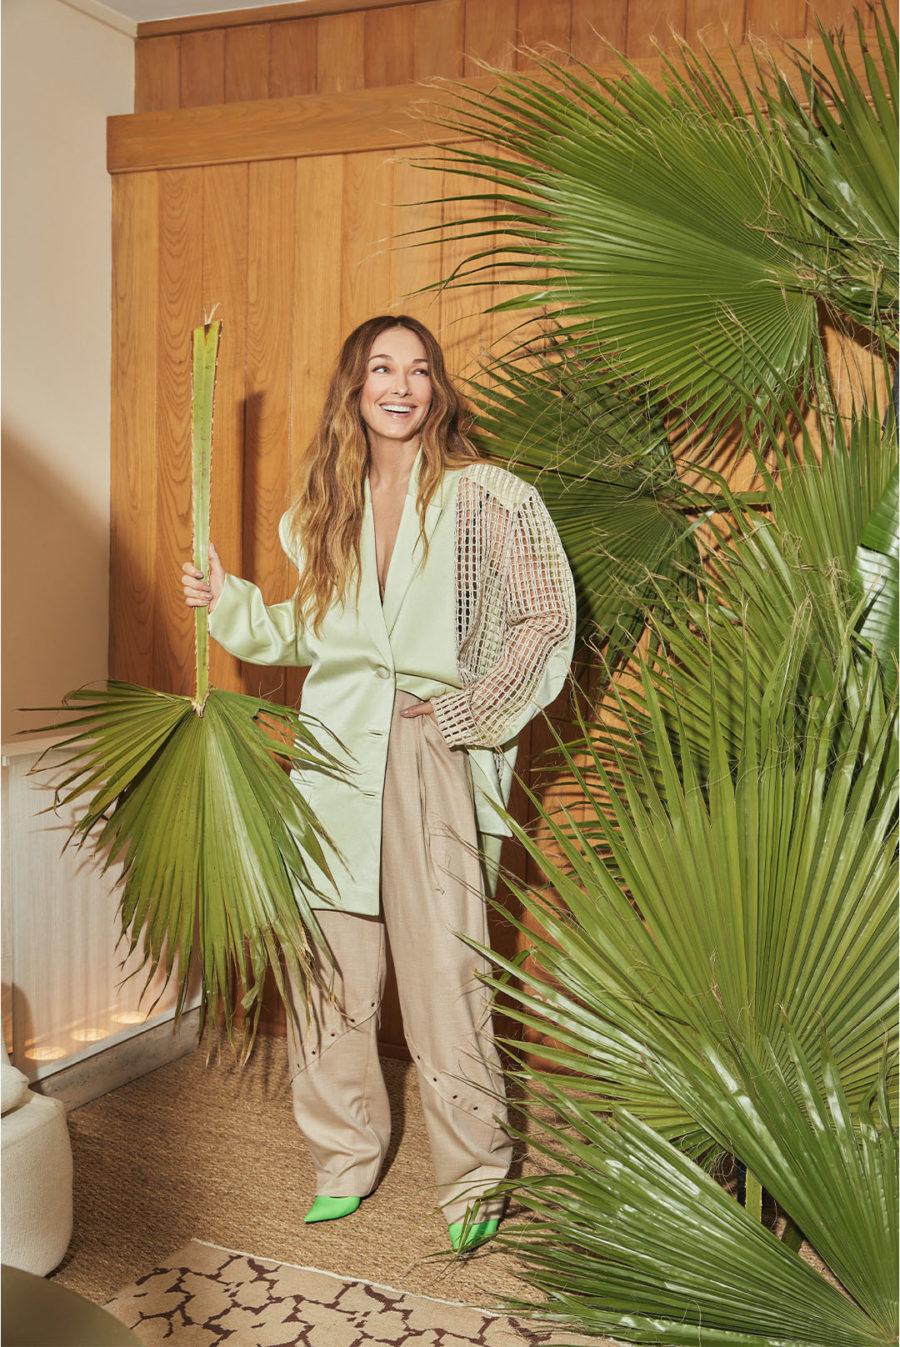 Photo of Kelly Wearstler infront of decor